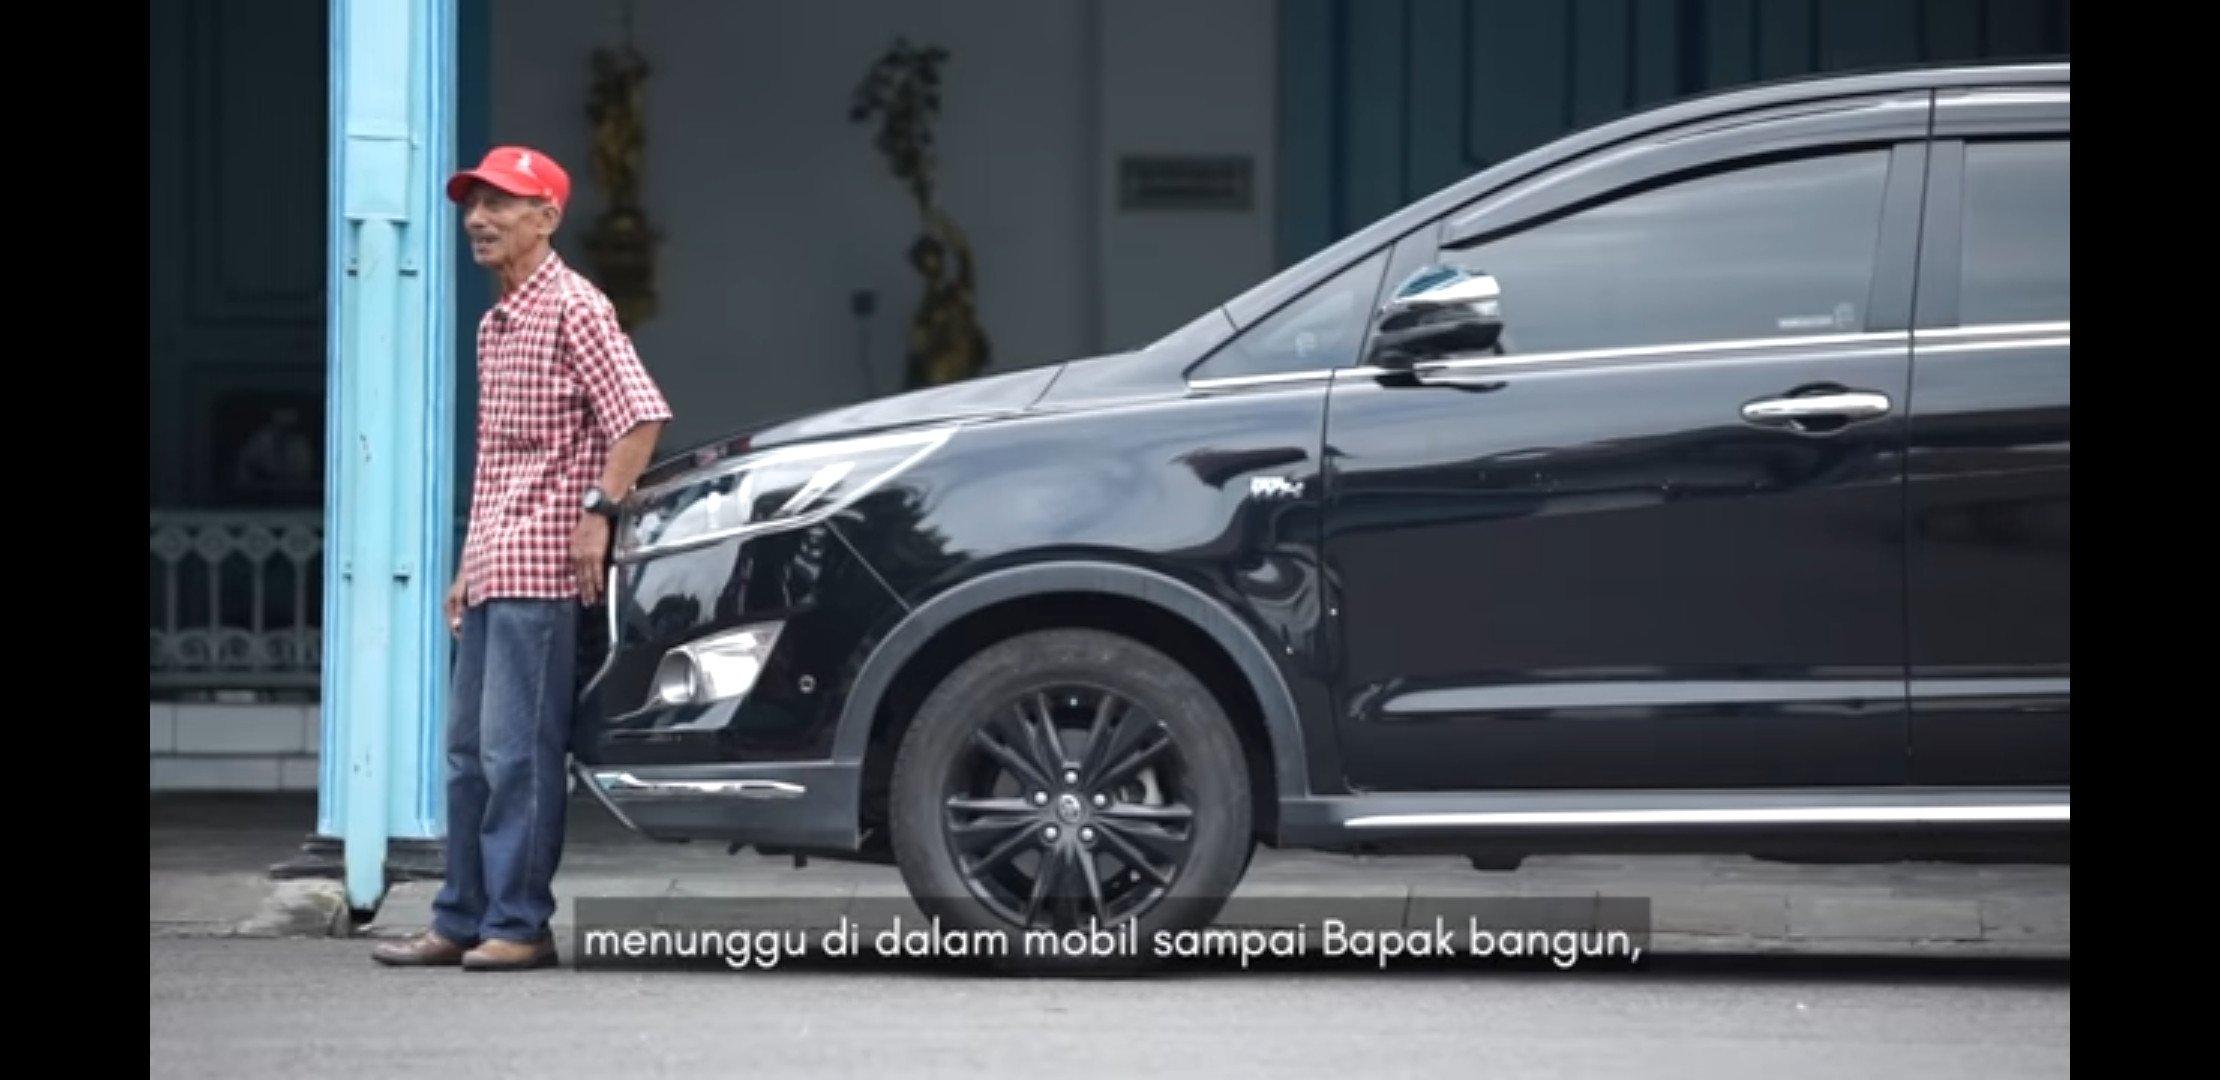 Begini Kisah Suliadi, Lelaki Asal Malang yang Jadi Sopir Jokowi - JPNN.com Jatim